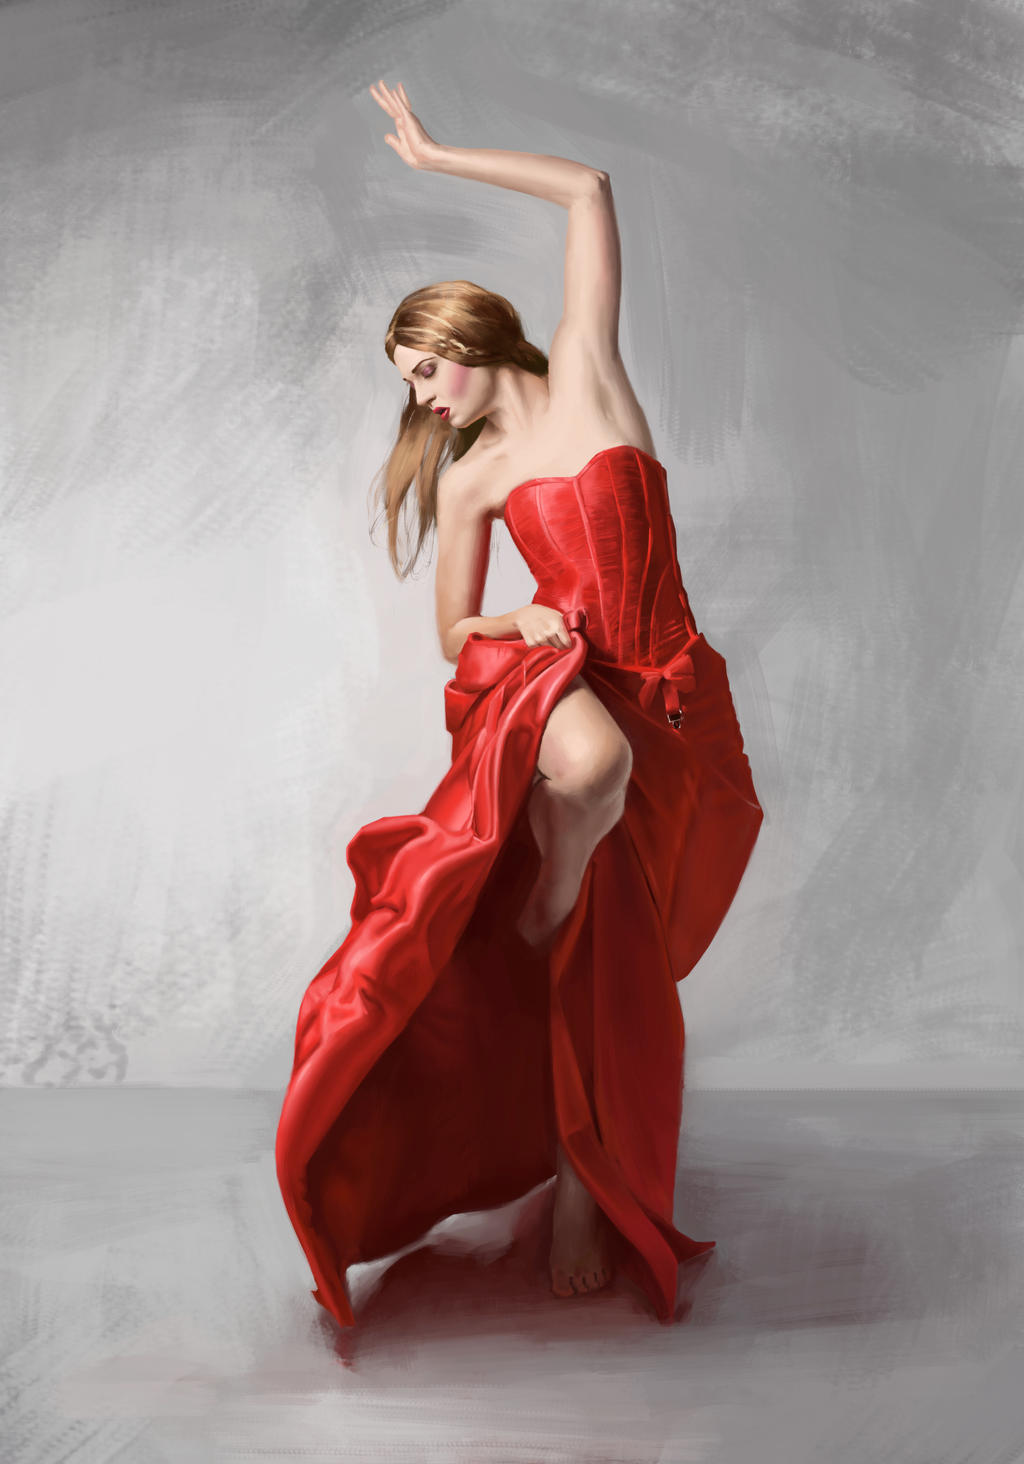 Dancing Woman in Red